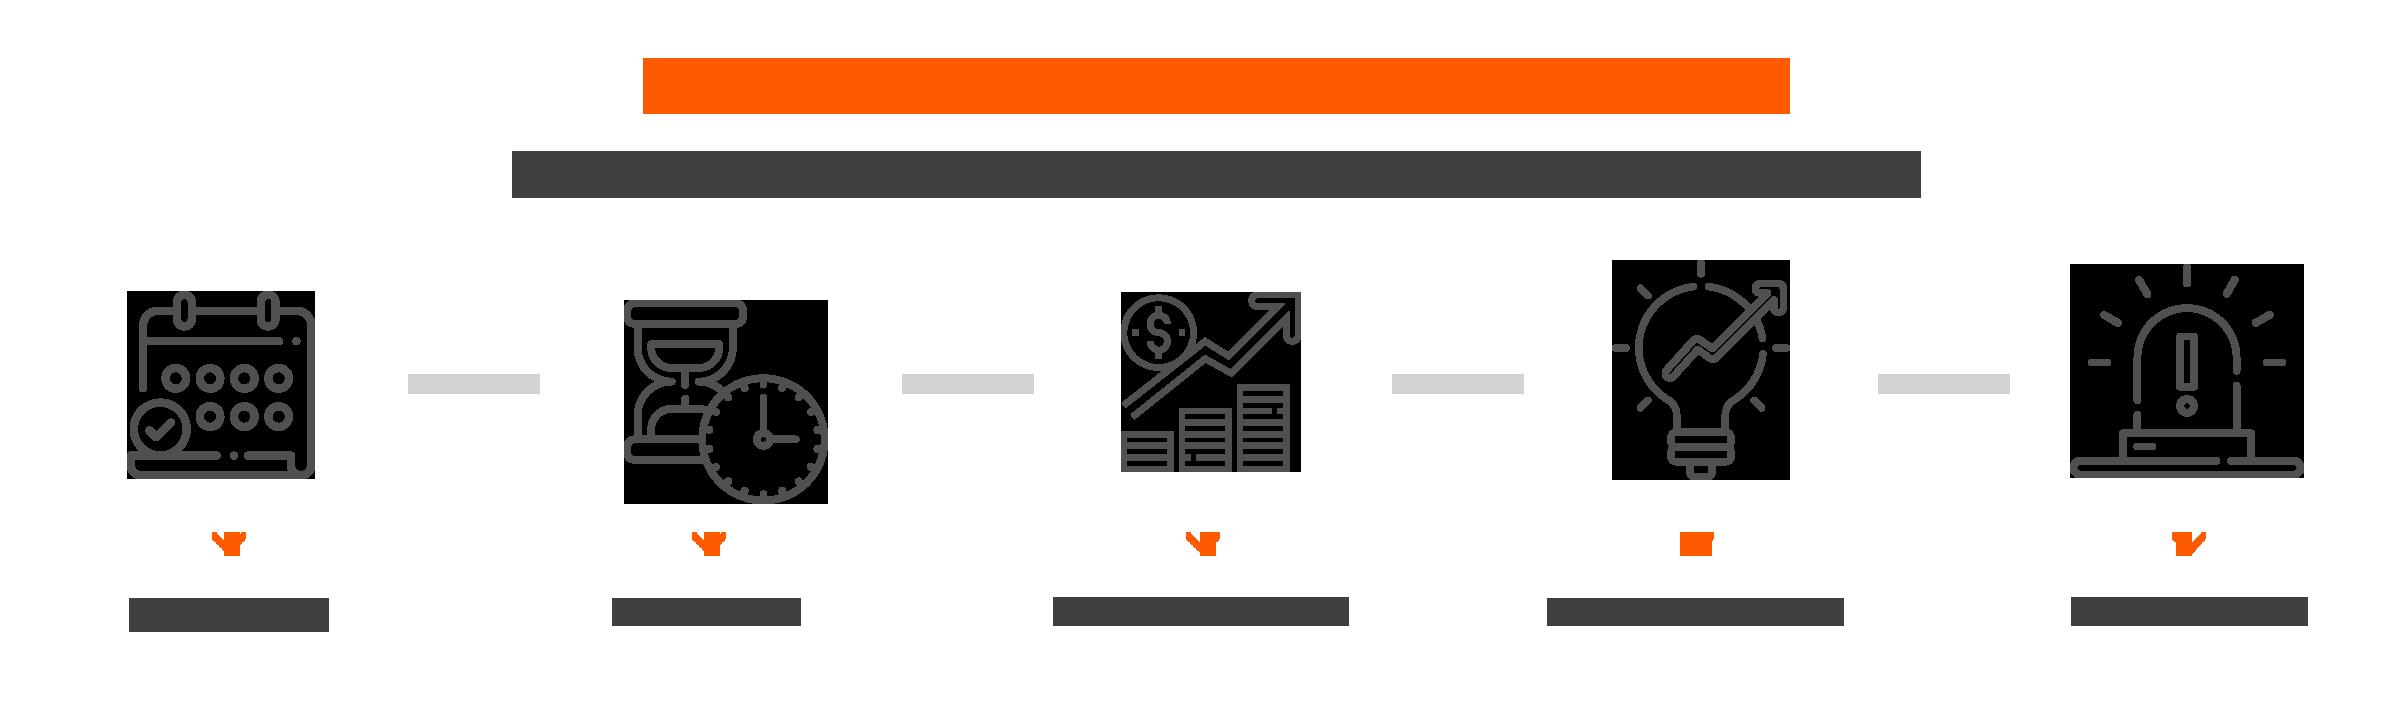 PX_Porfolio_Consolidation_v3